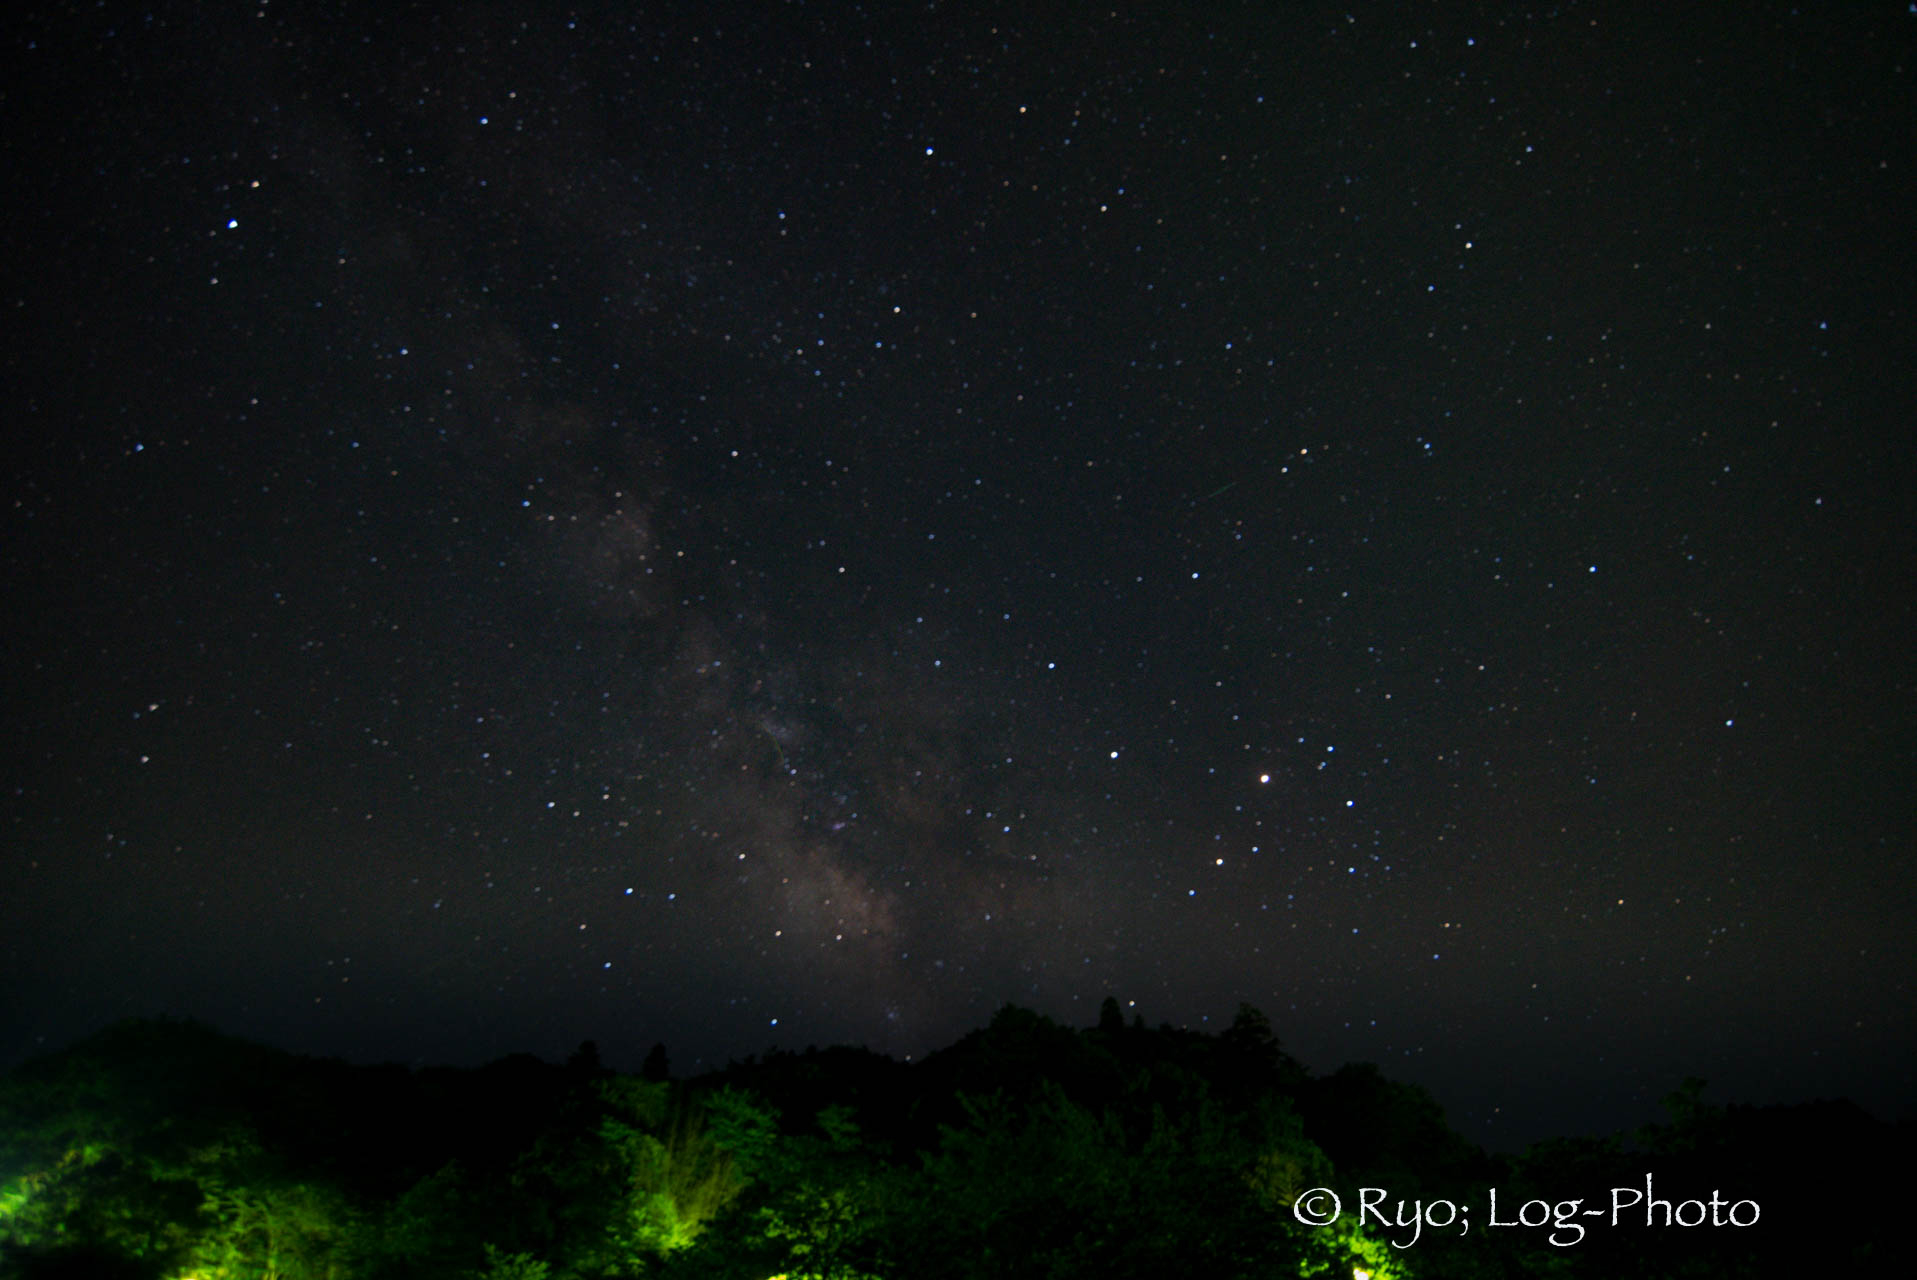 千葉県 亀山湖 夜景 天の川